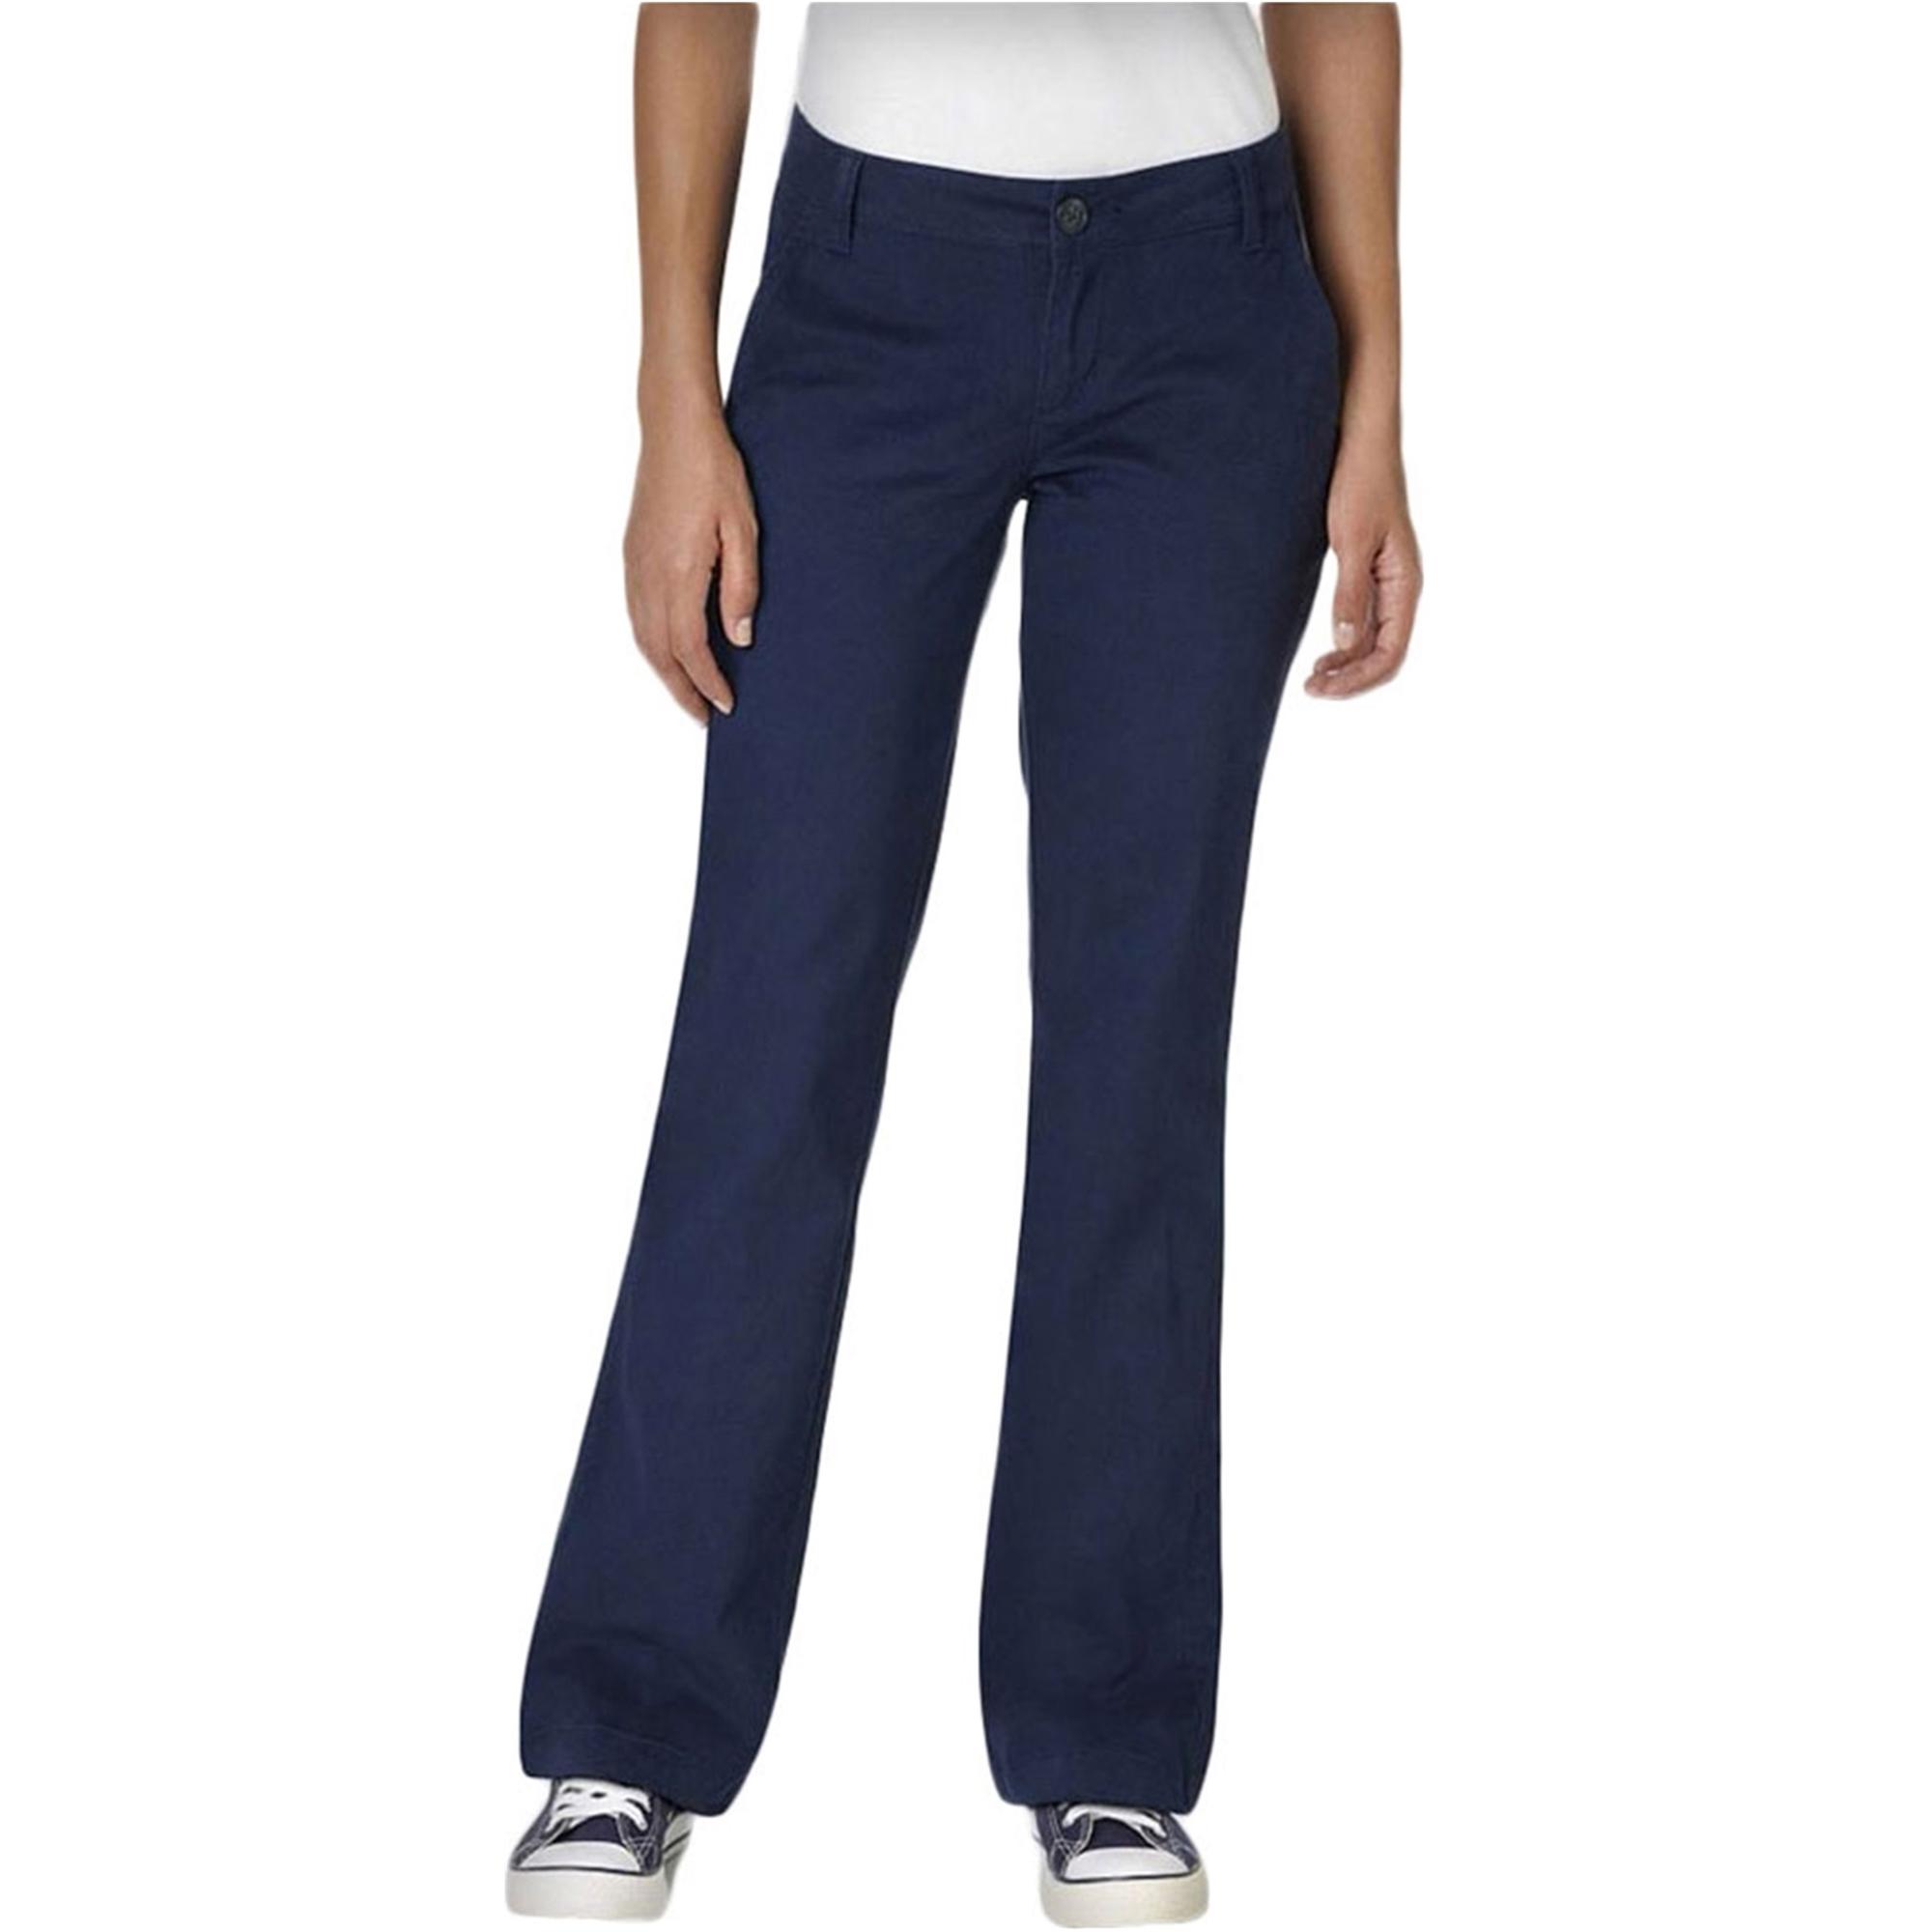 Aeropostale Womens Basic Casual Chino Pants